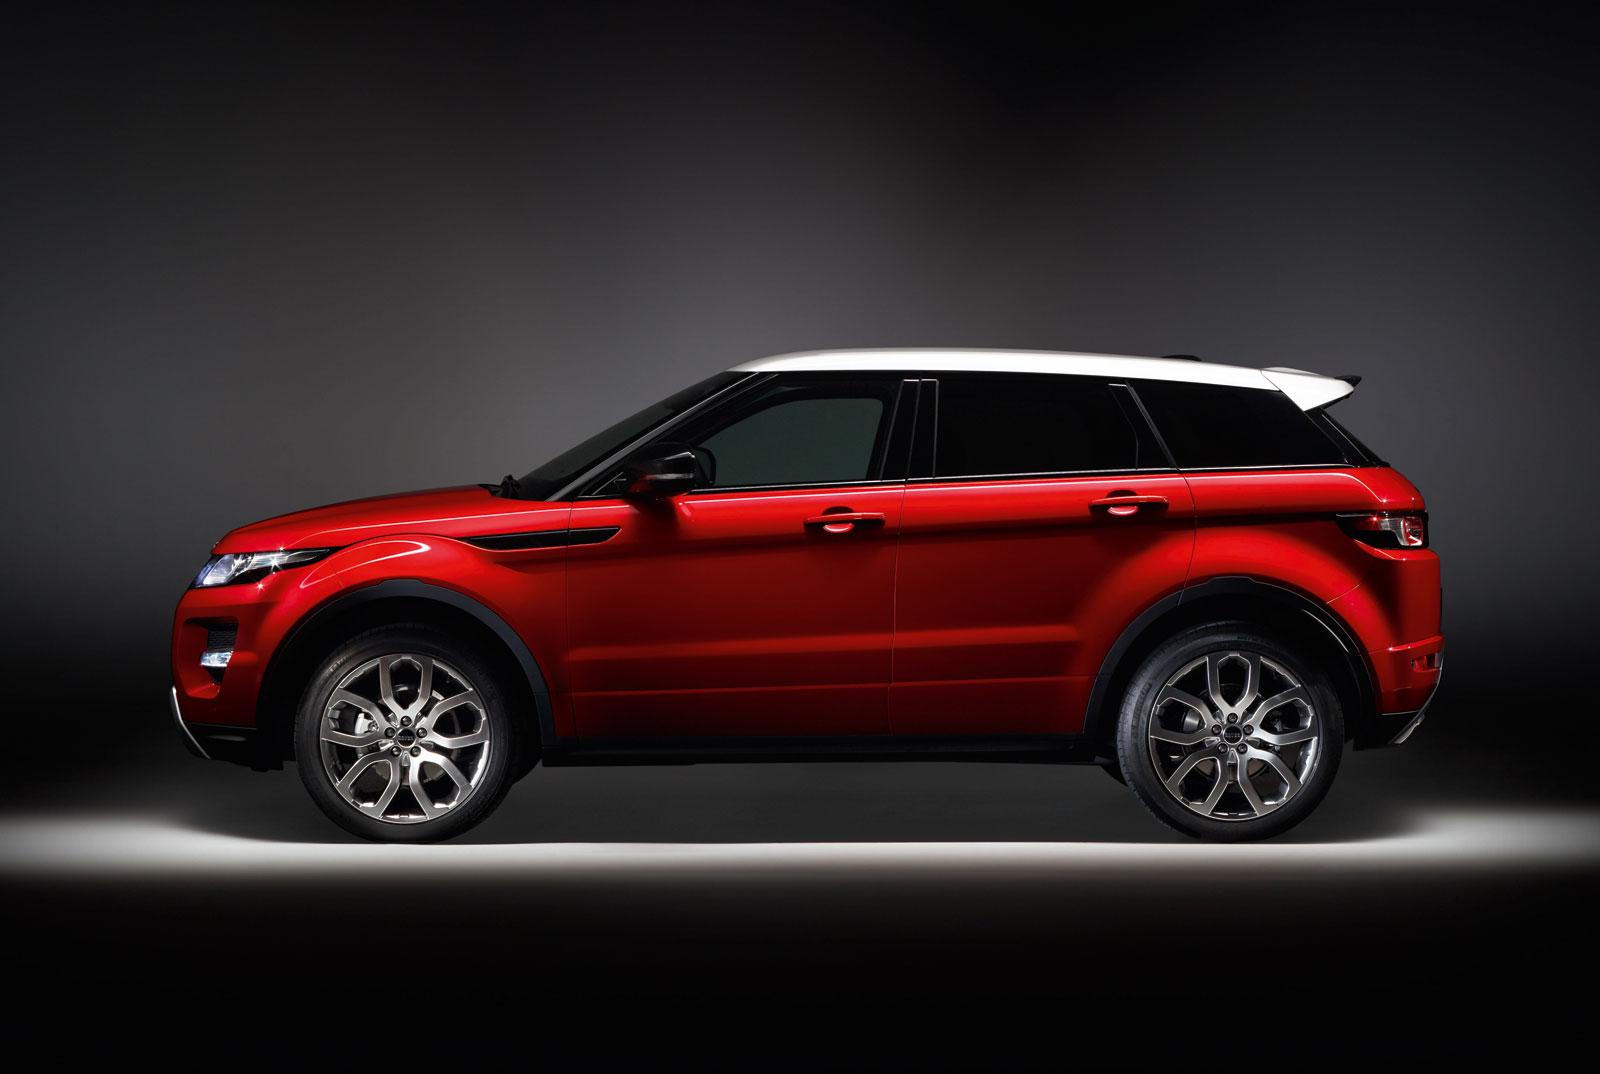 Land Rover Jaguar studia l'auto intelligente